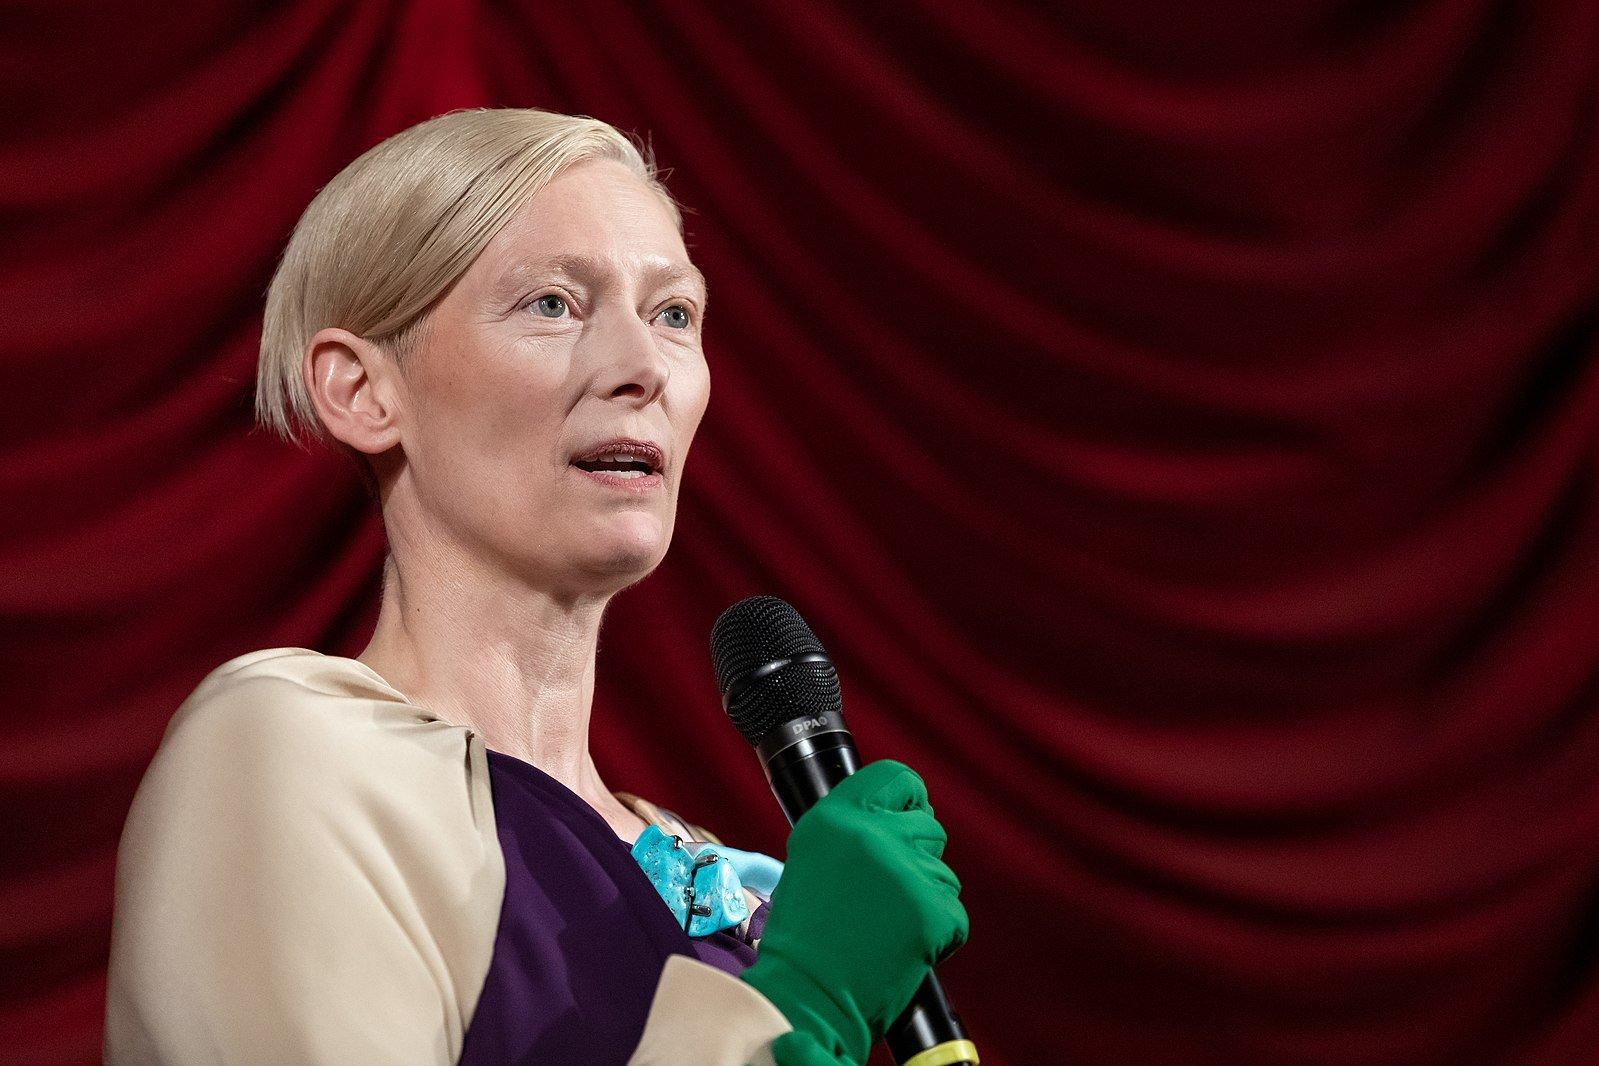 Tilda Swinton Calls Upon Streamers to Build Movie Theaters